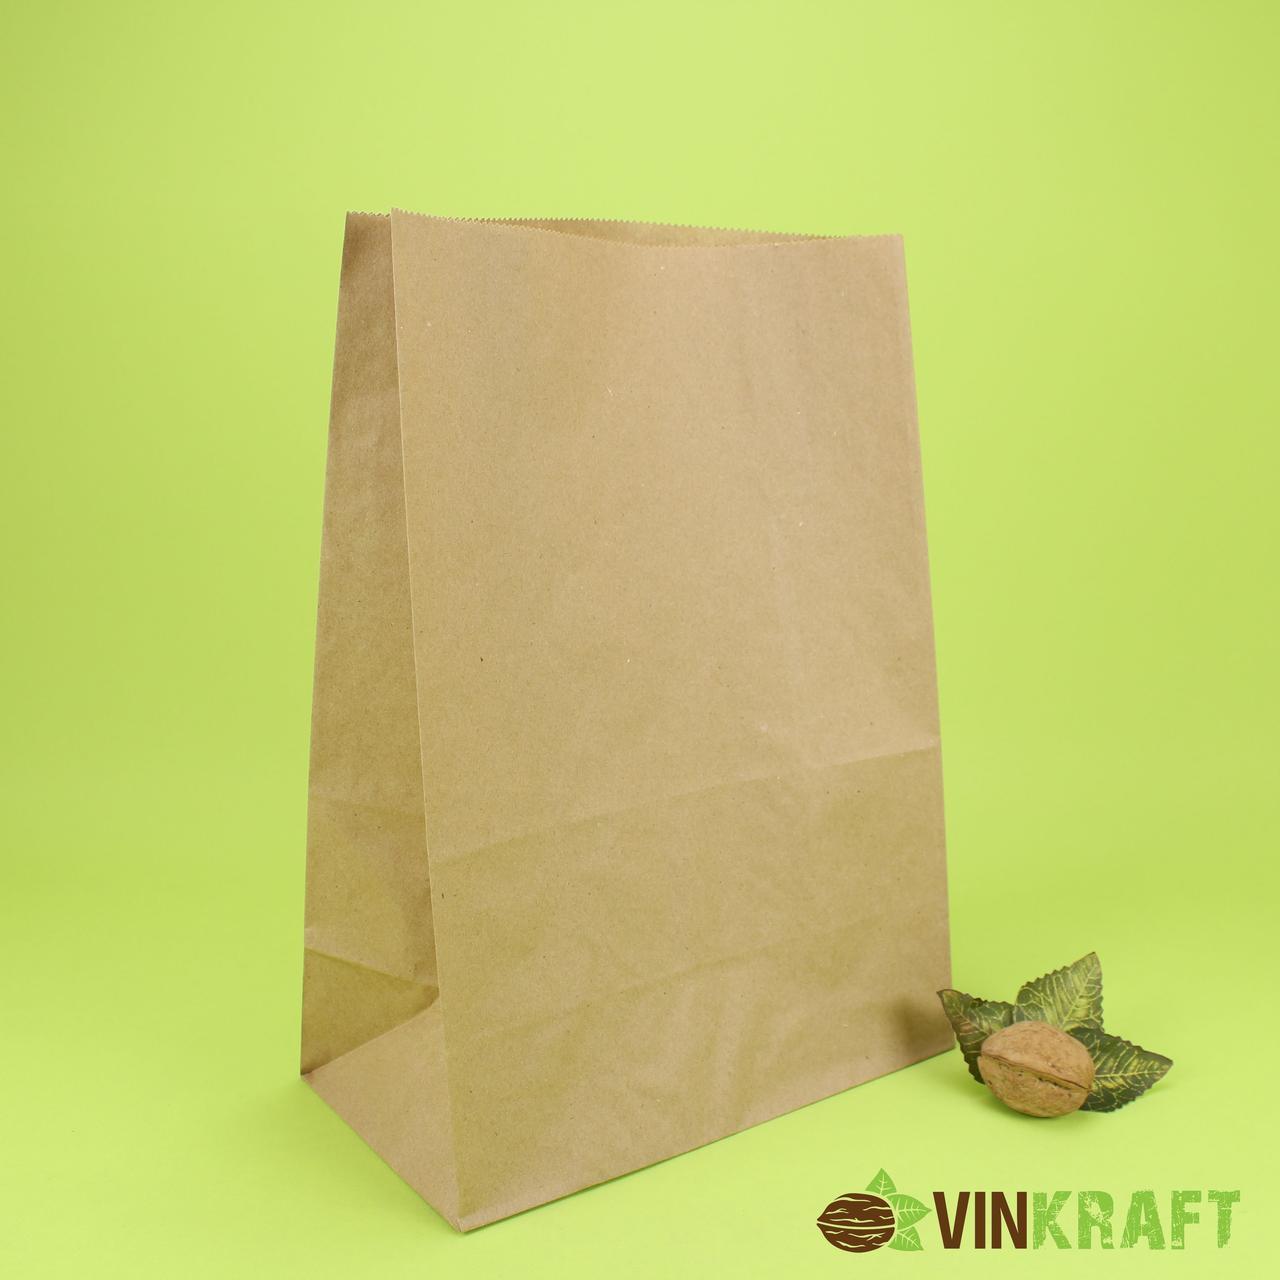 Паперовий пакет з дном 230*120*290 (80 г/м2), крафт